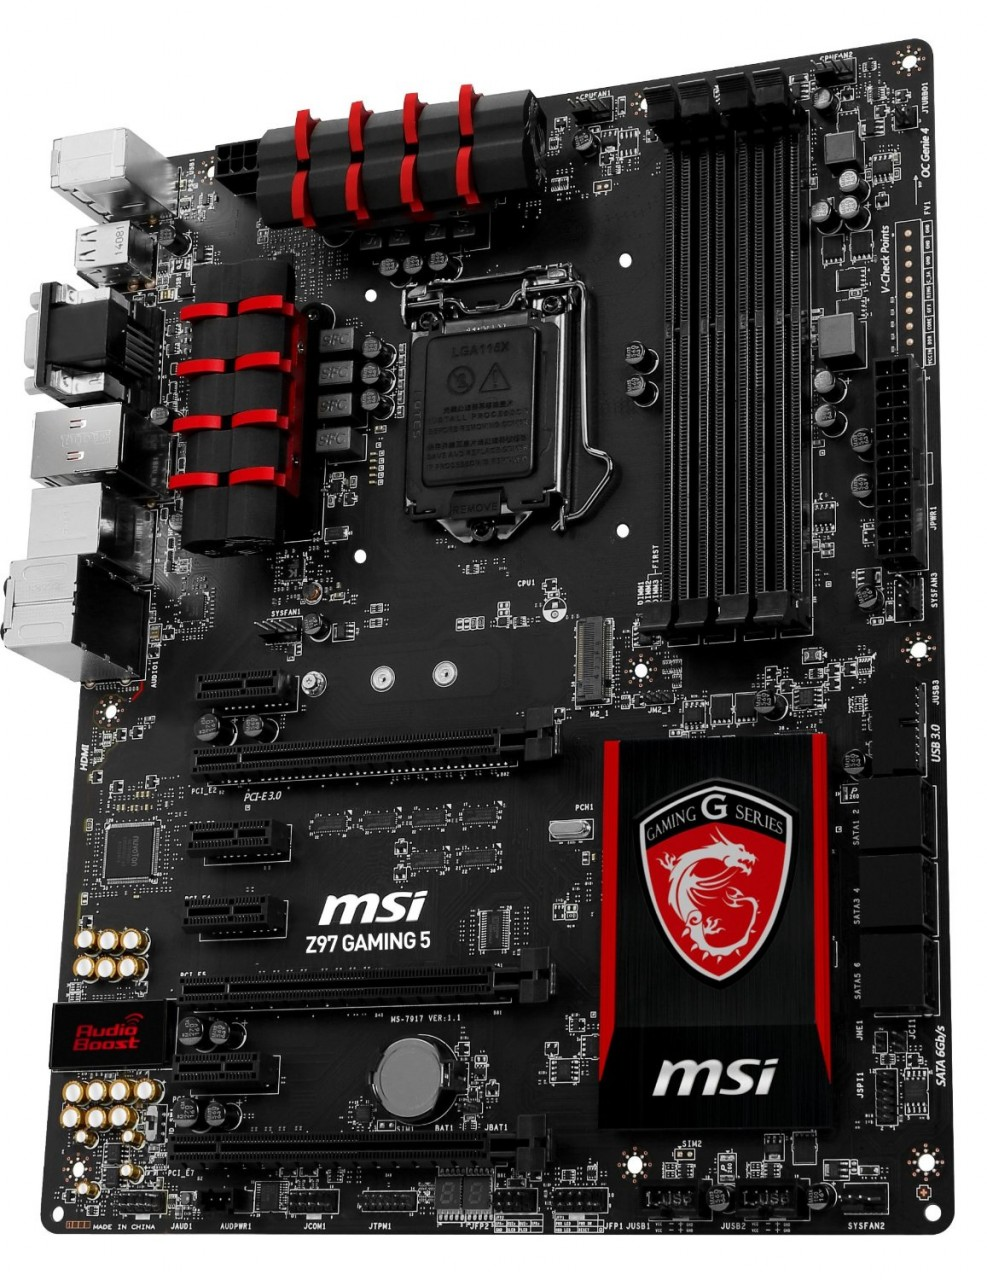 MSI Z97-Gaming 5 LGA 1150 Intel Z97 HDMI SATA 6Gb/s USB 3